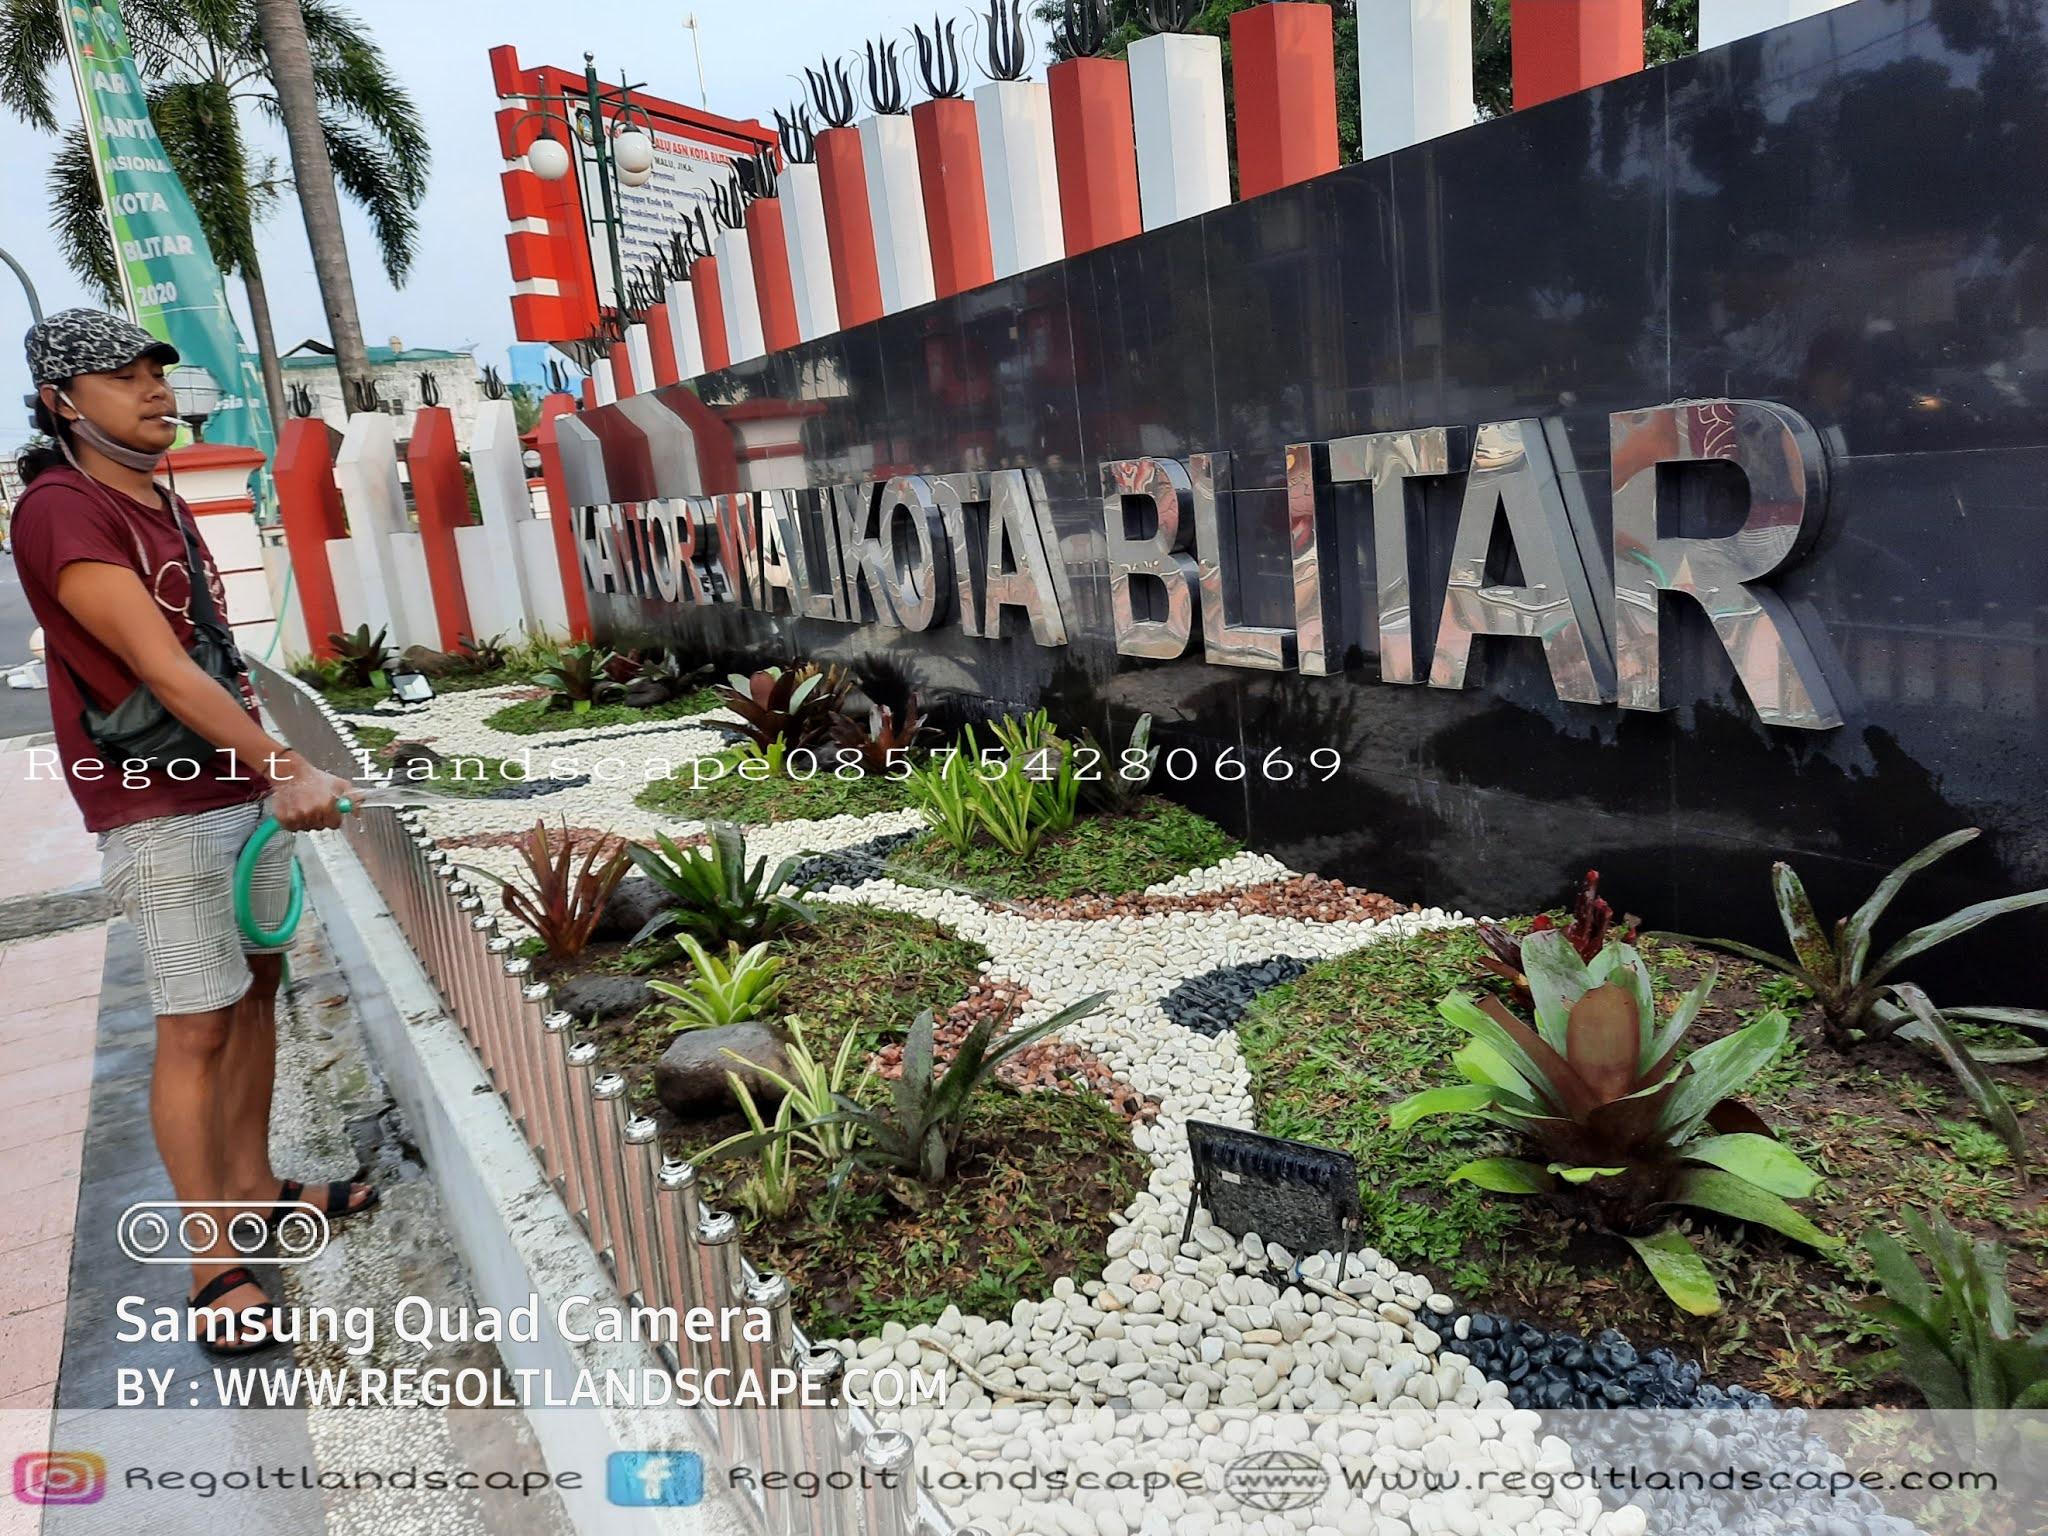 Jasa Tukang Taman Surabaya   Tukang Taman Surabaya